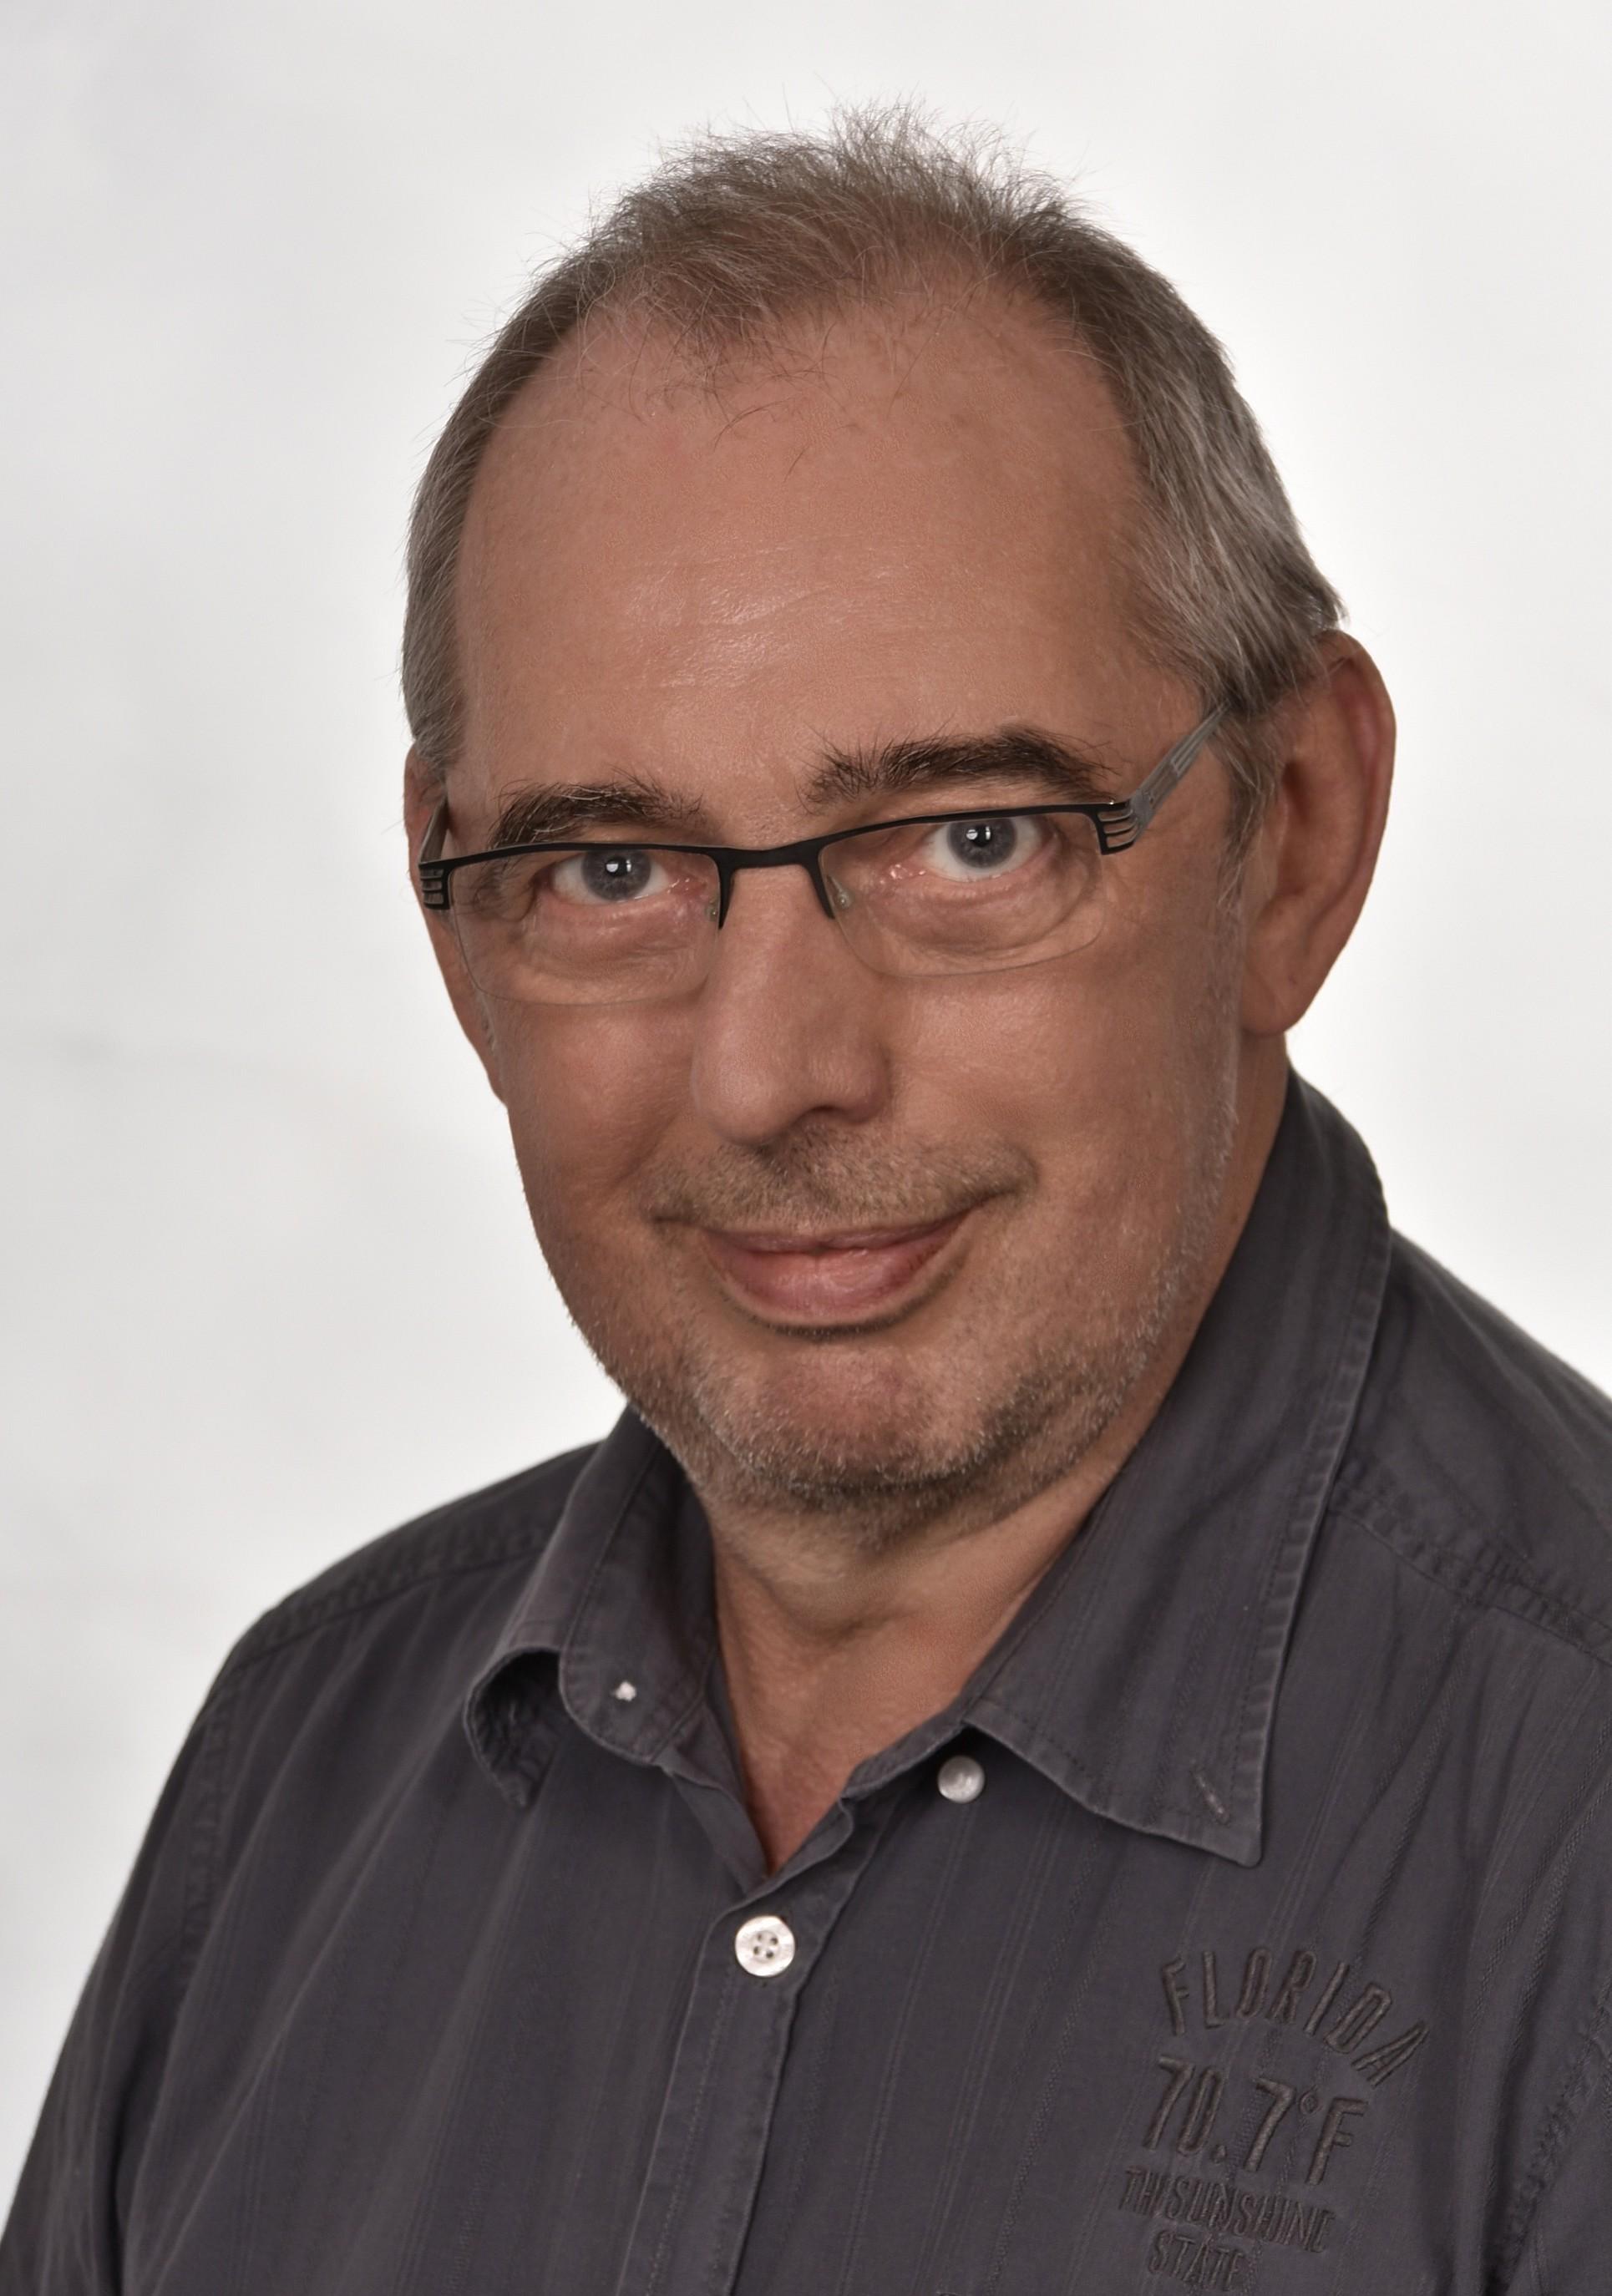 Dr. Reiner Schölles